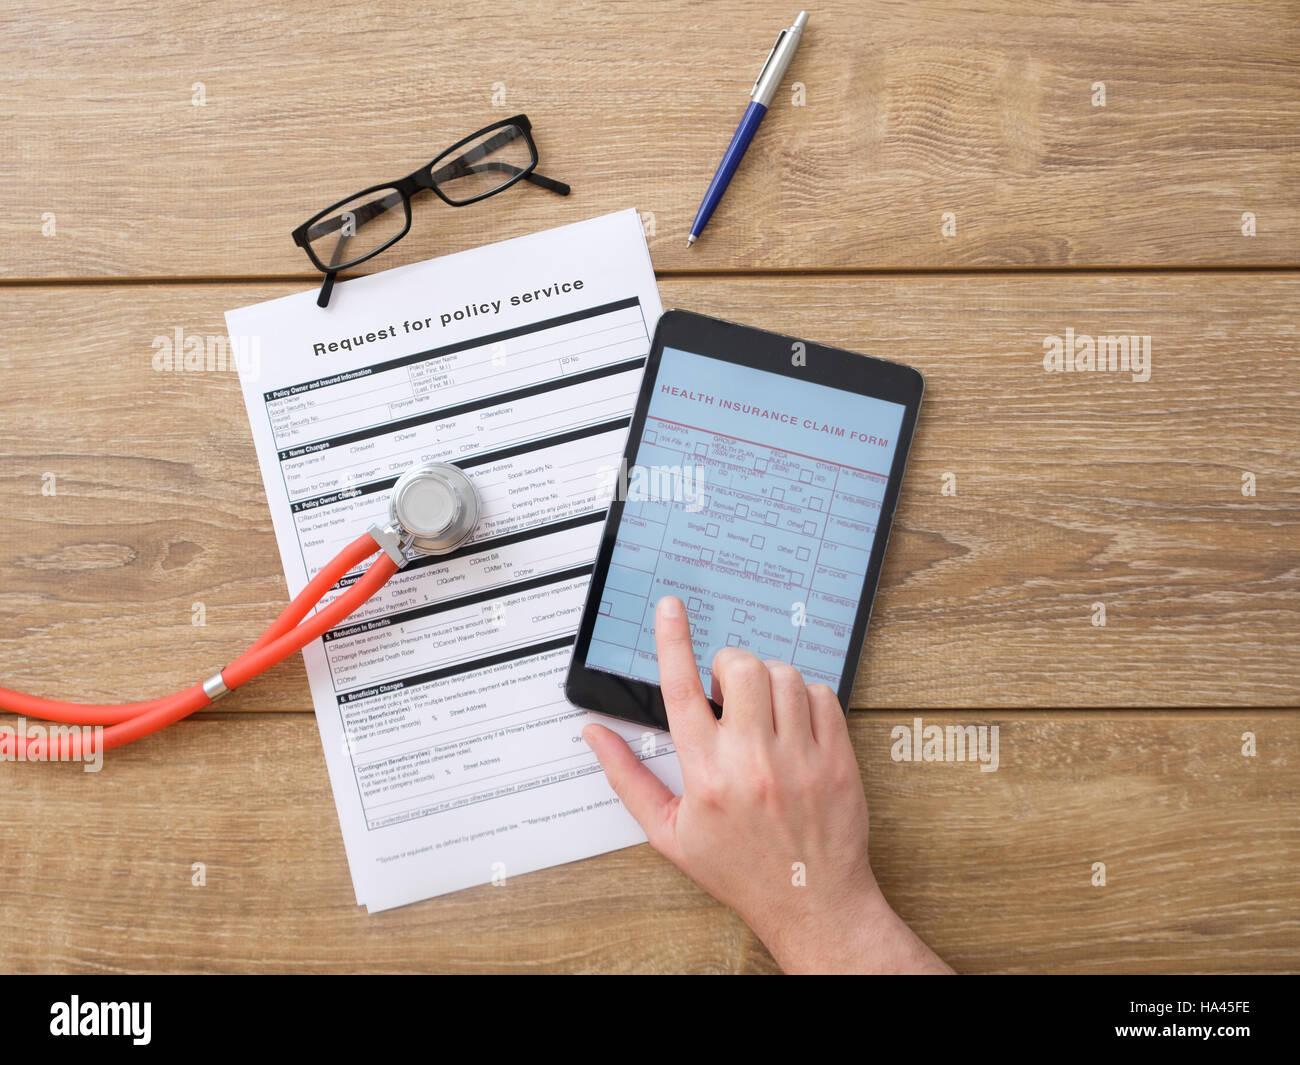 Health insurance claim internet online form - Stock Image